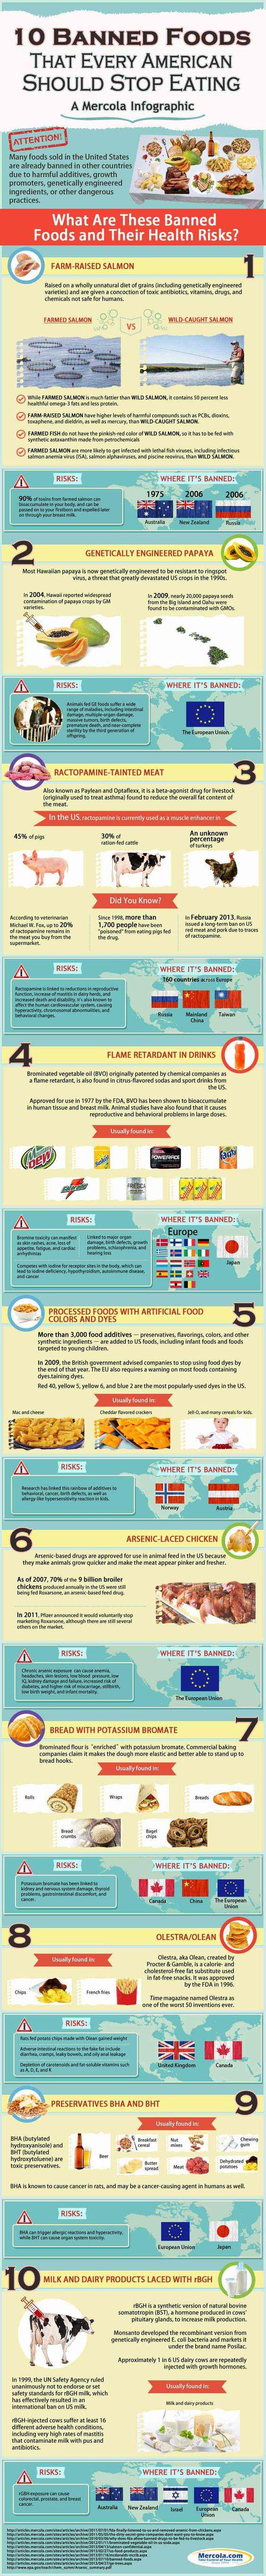 Should we ban salt in processed food?